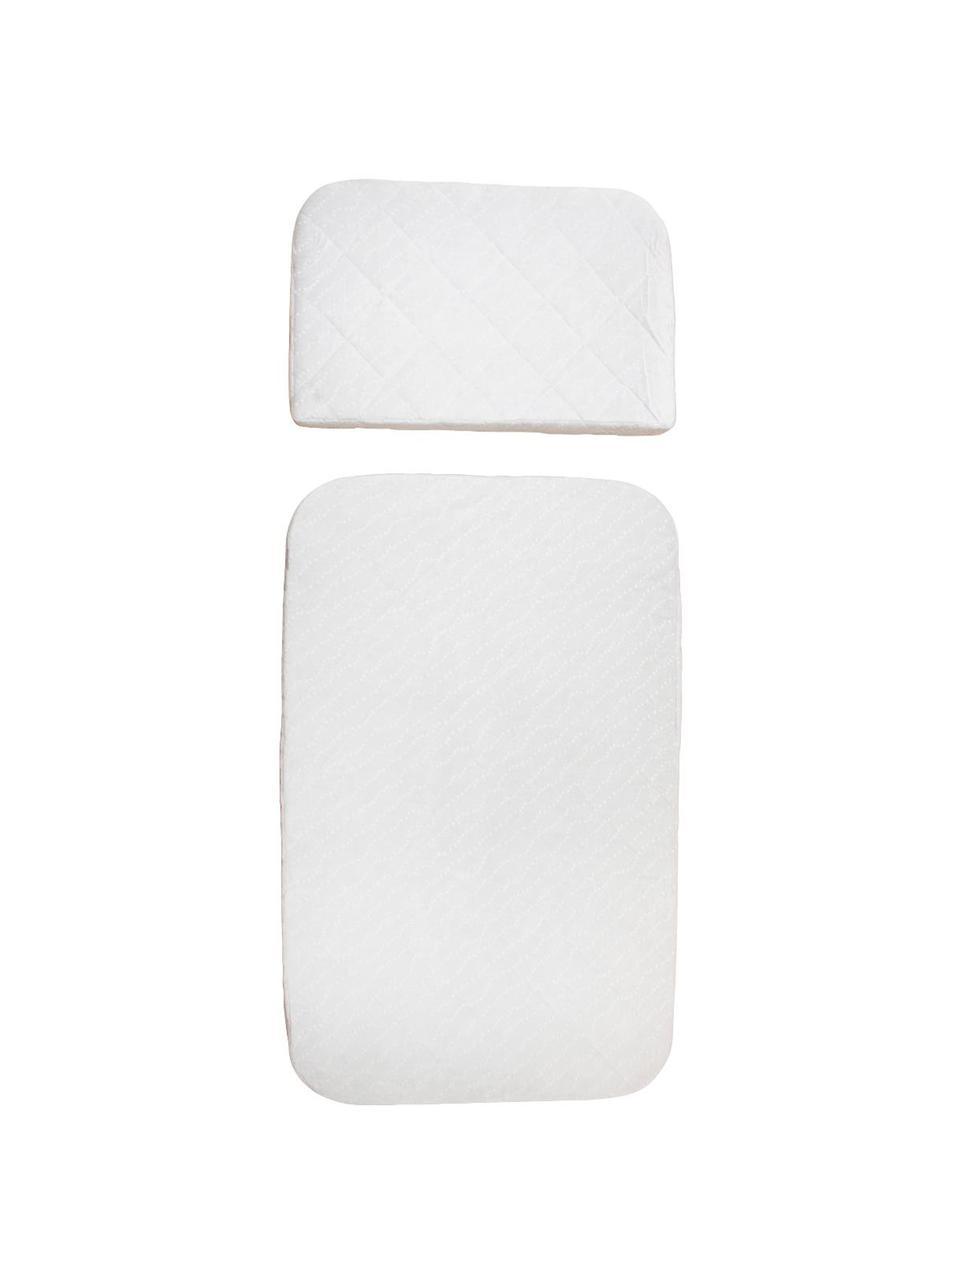 Matratzen-Set Harmony, 2-tlg., Bezug: Baumwolle, Weiß, 70 x 113 cm